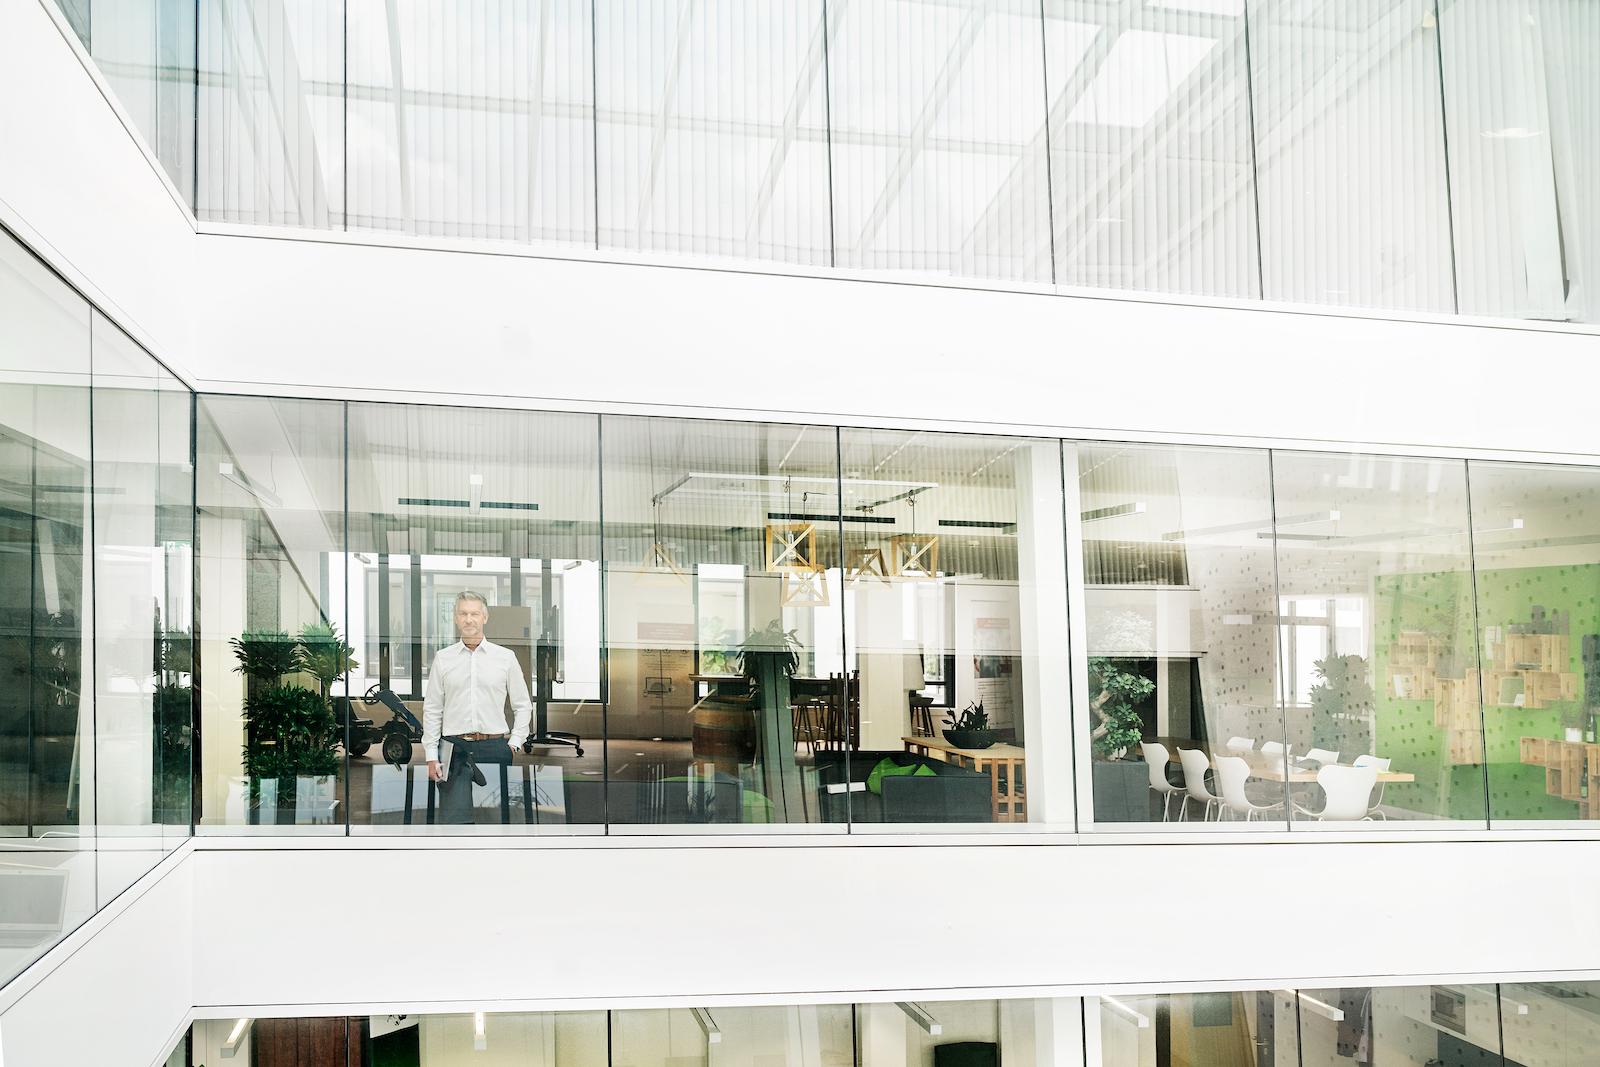 Business Mann in schönem Büro Gebäude